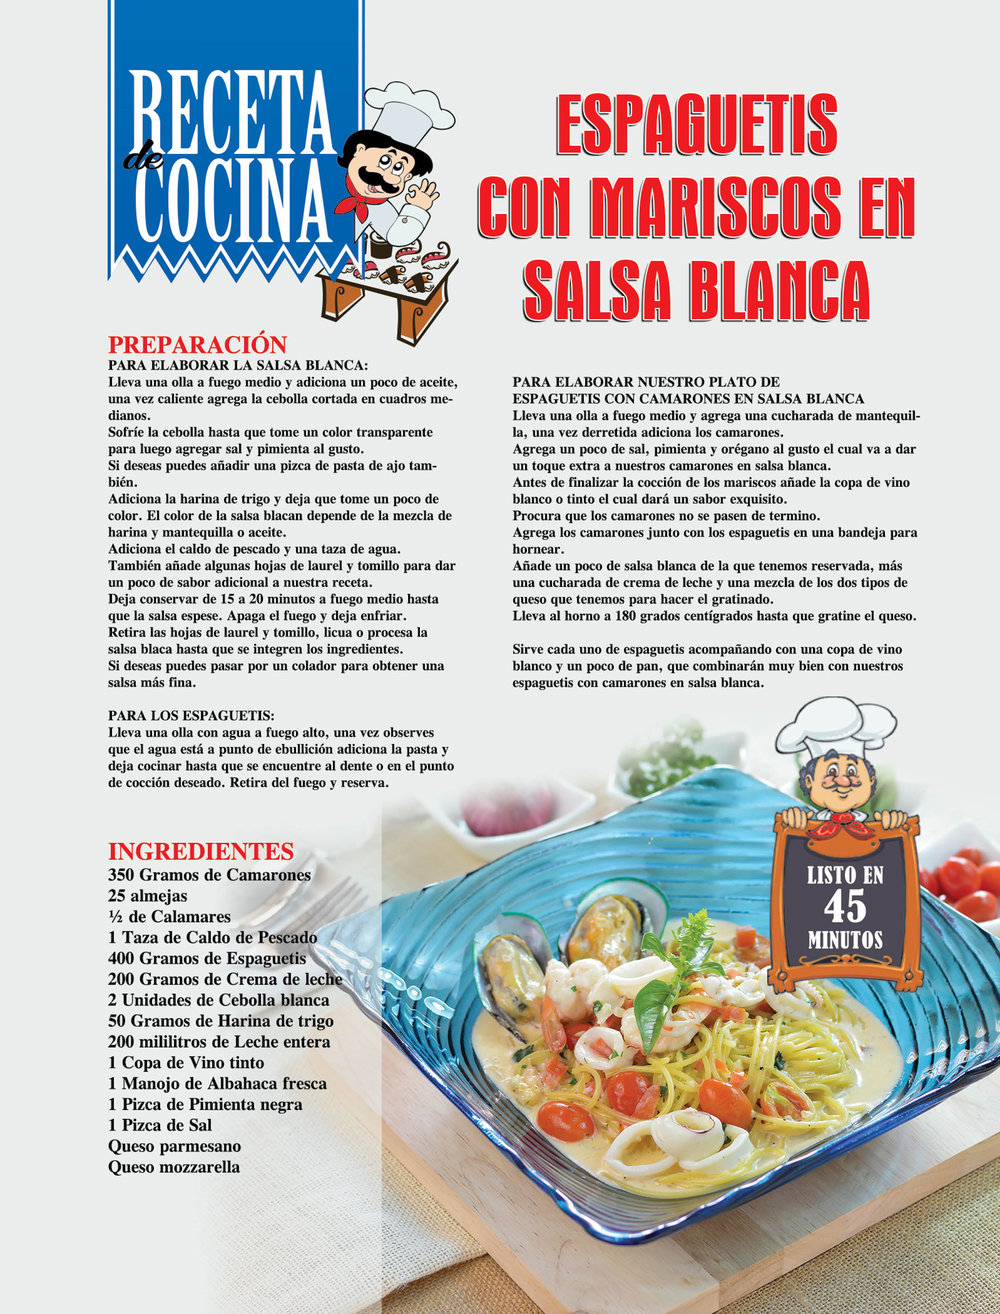 Receta De Cocina: Espaguetis Con Mariscos En Salsa Blanca